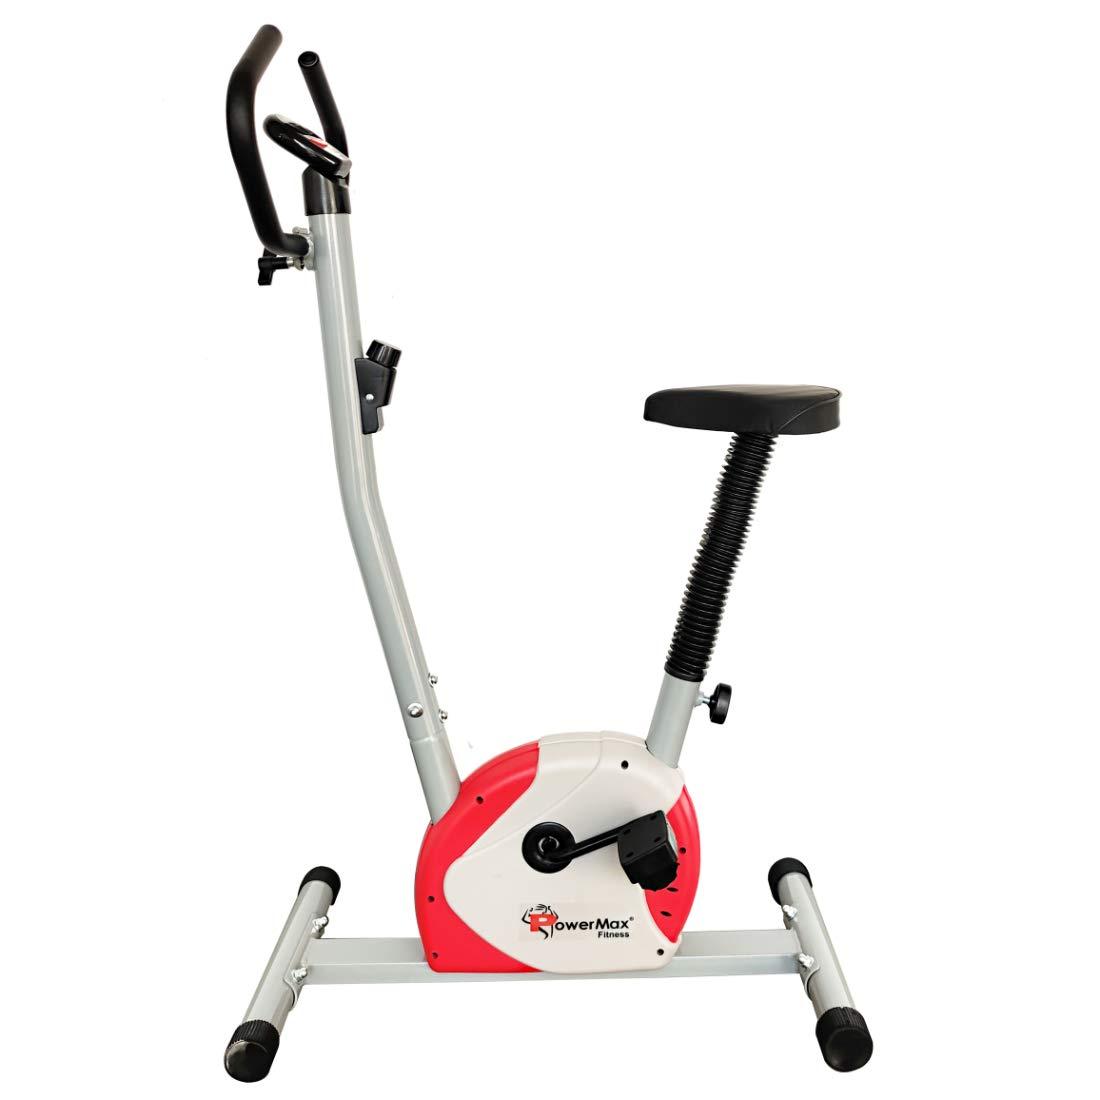 PowerMax Fitness BU-200 Best Exercise Cycles In India